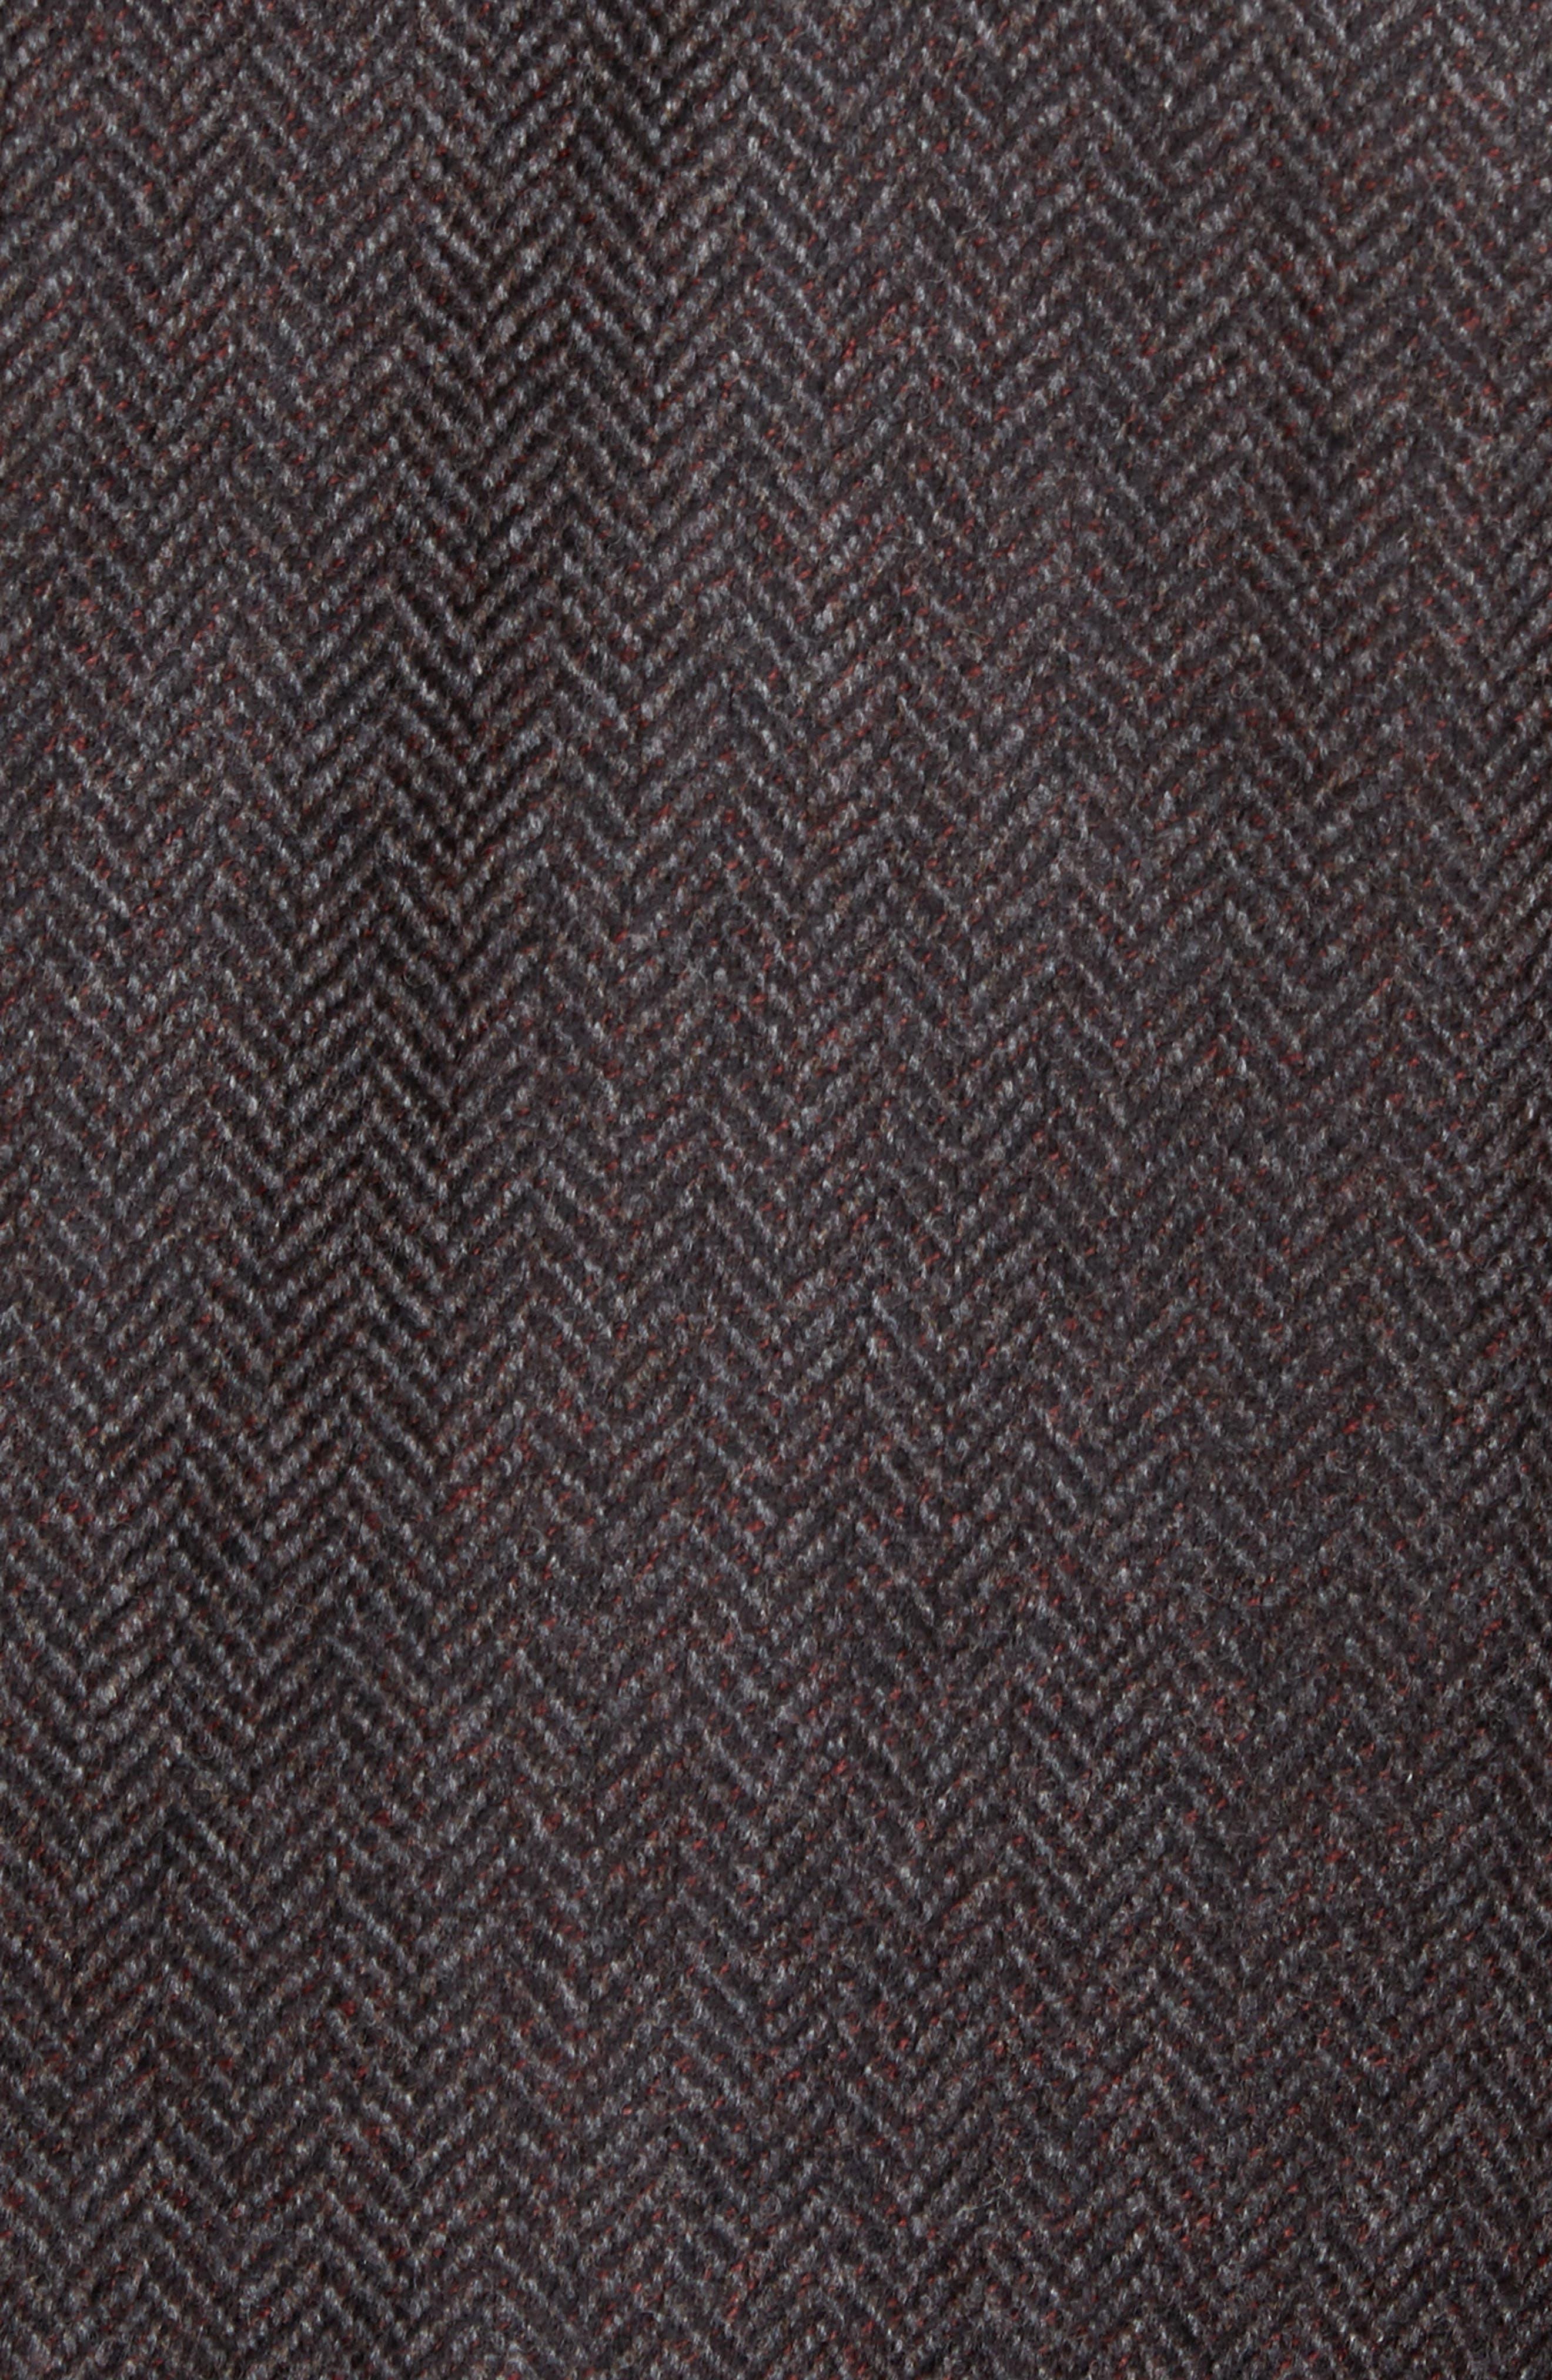 Ritchie Hybrid Classic Fit Wool & Cashmere Herringbone Sport Coat,                             Alternate thumbnail 5, color,                             Grey